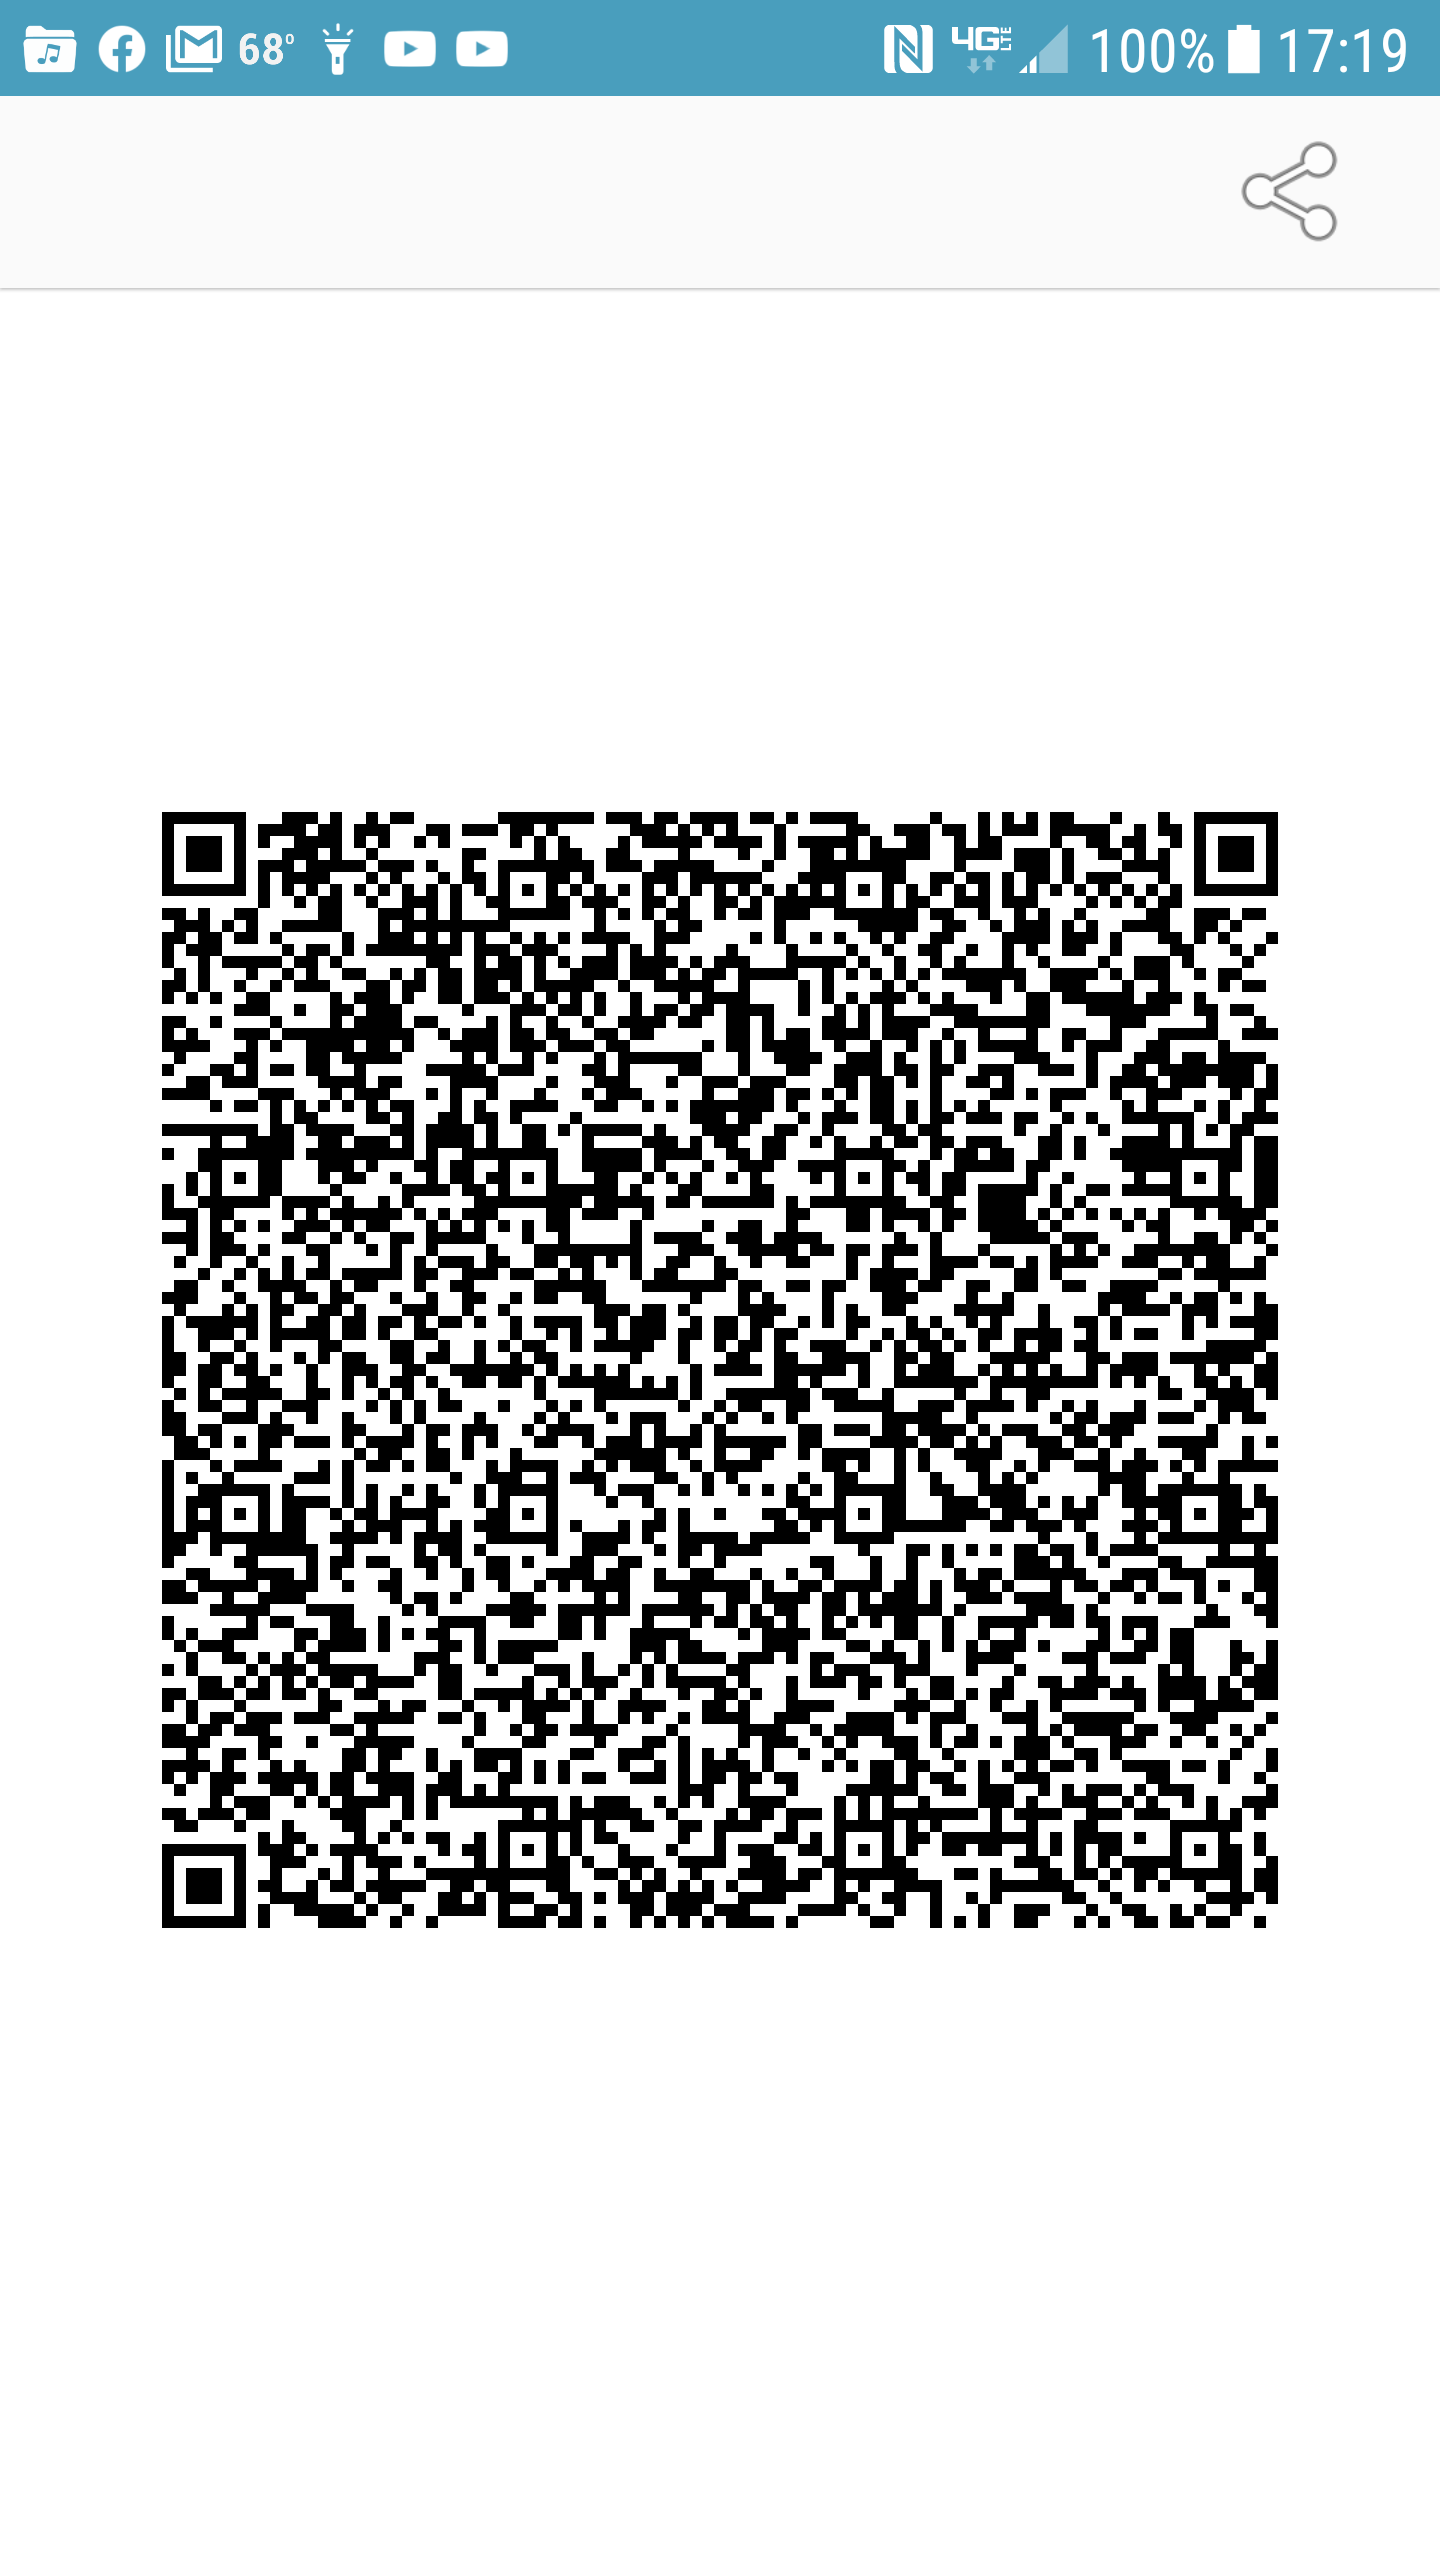 Screenshot_20190925-171926.png